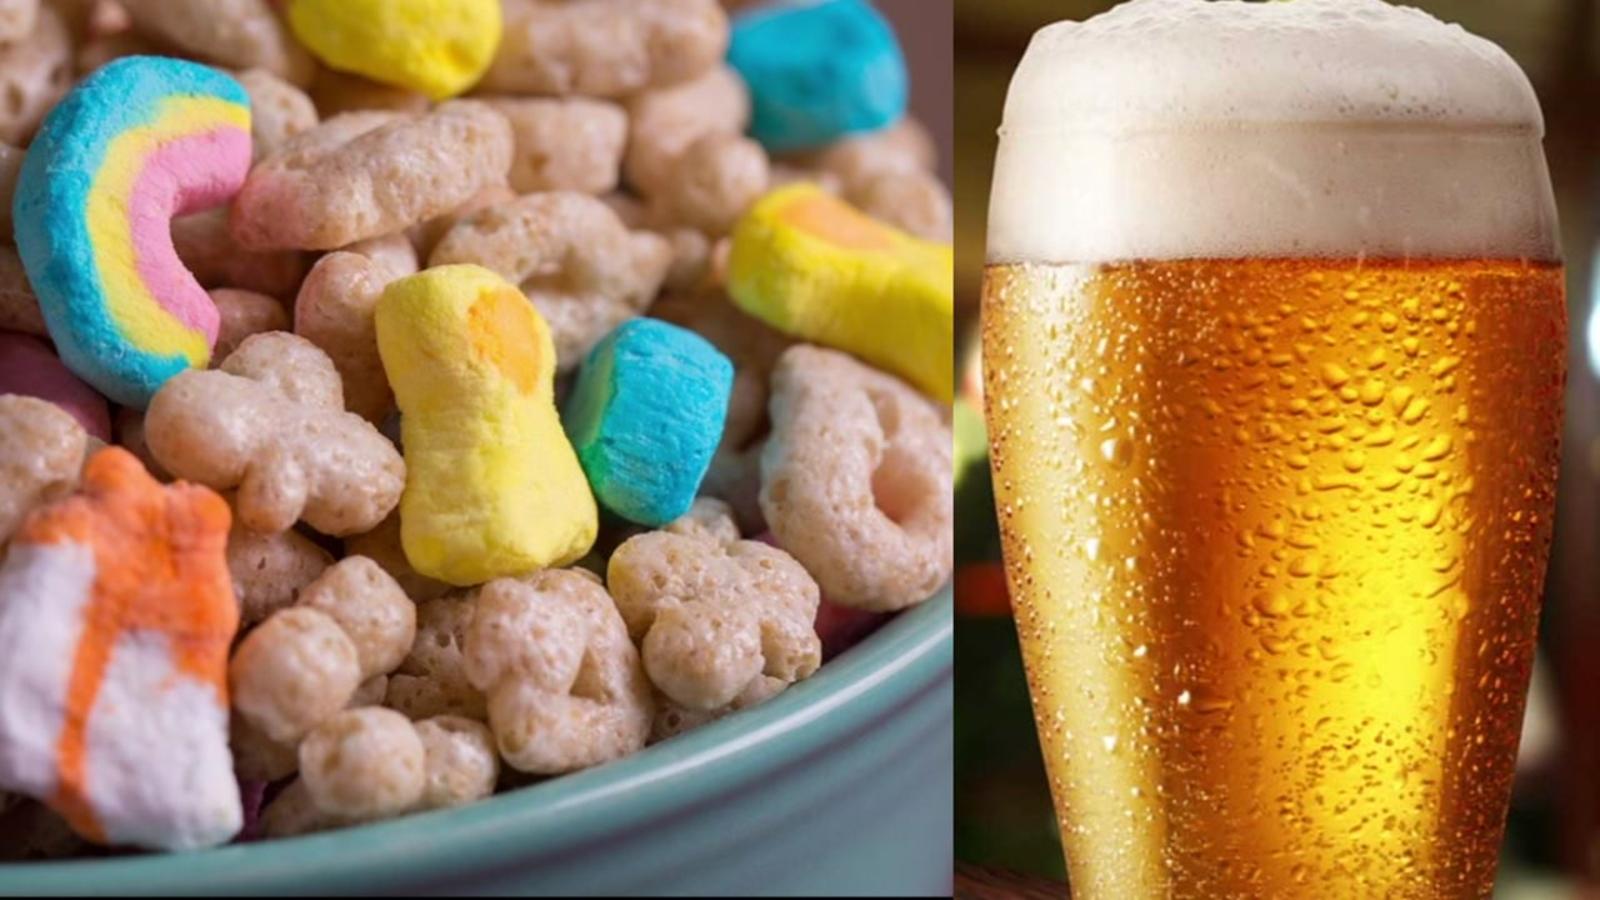 Magically Delicious Virginia Brewery To Release Lucky